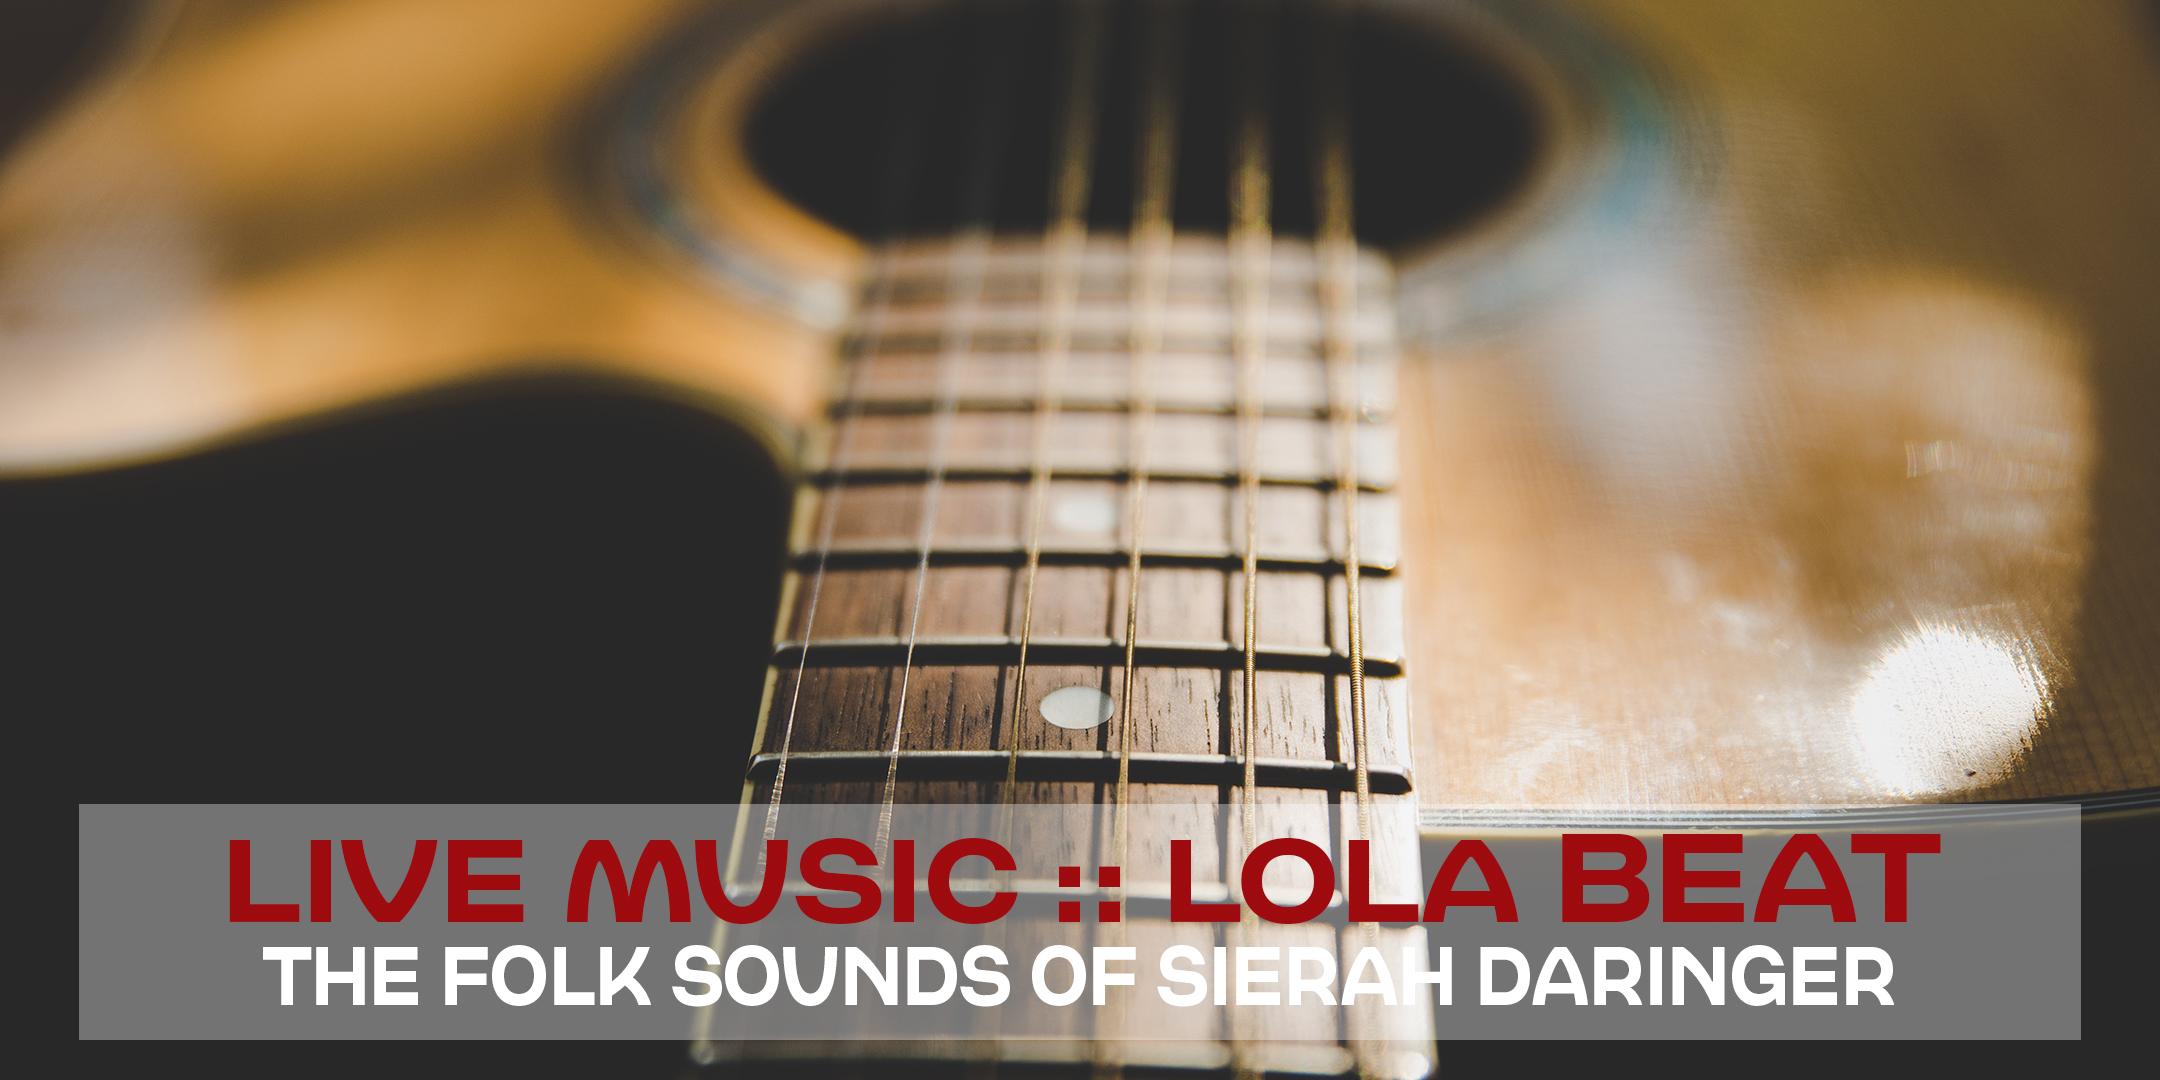 lola-beat